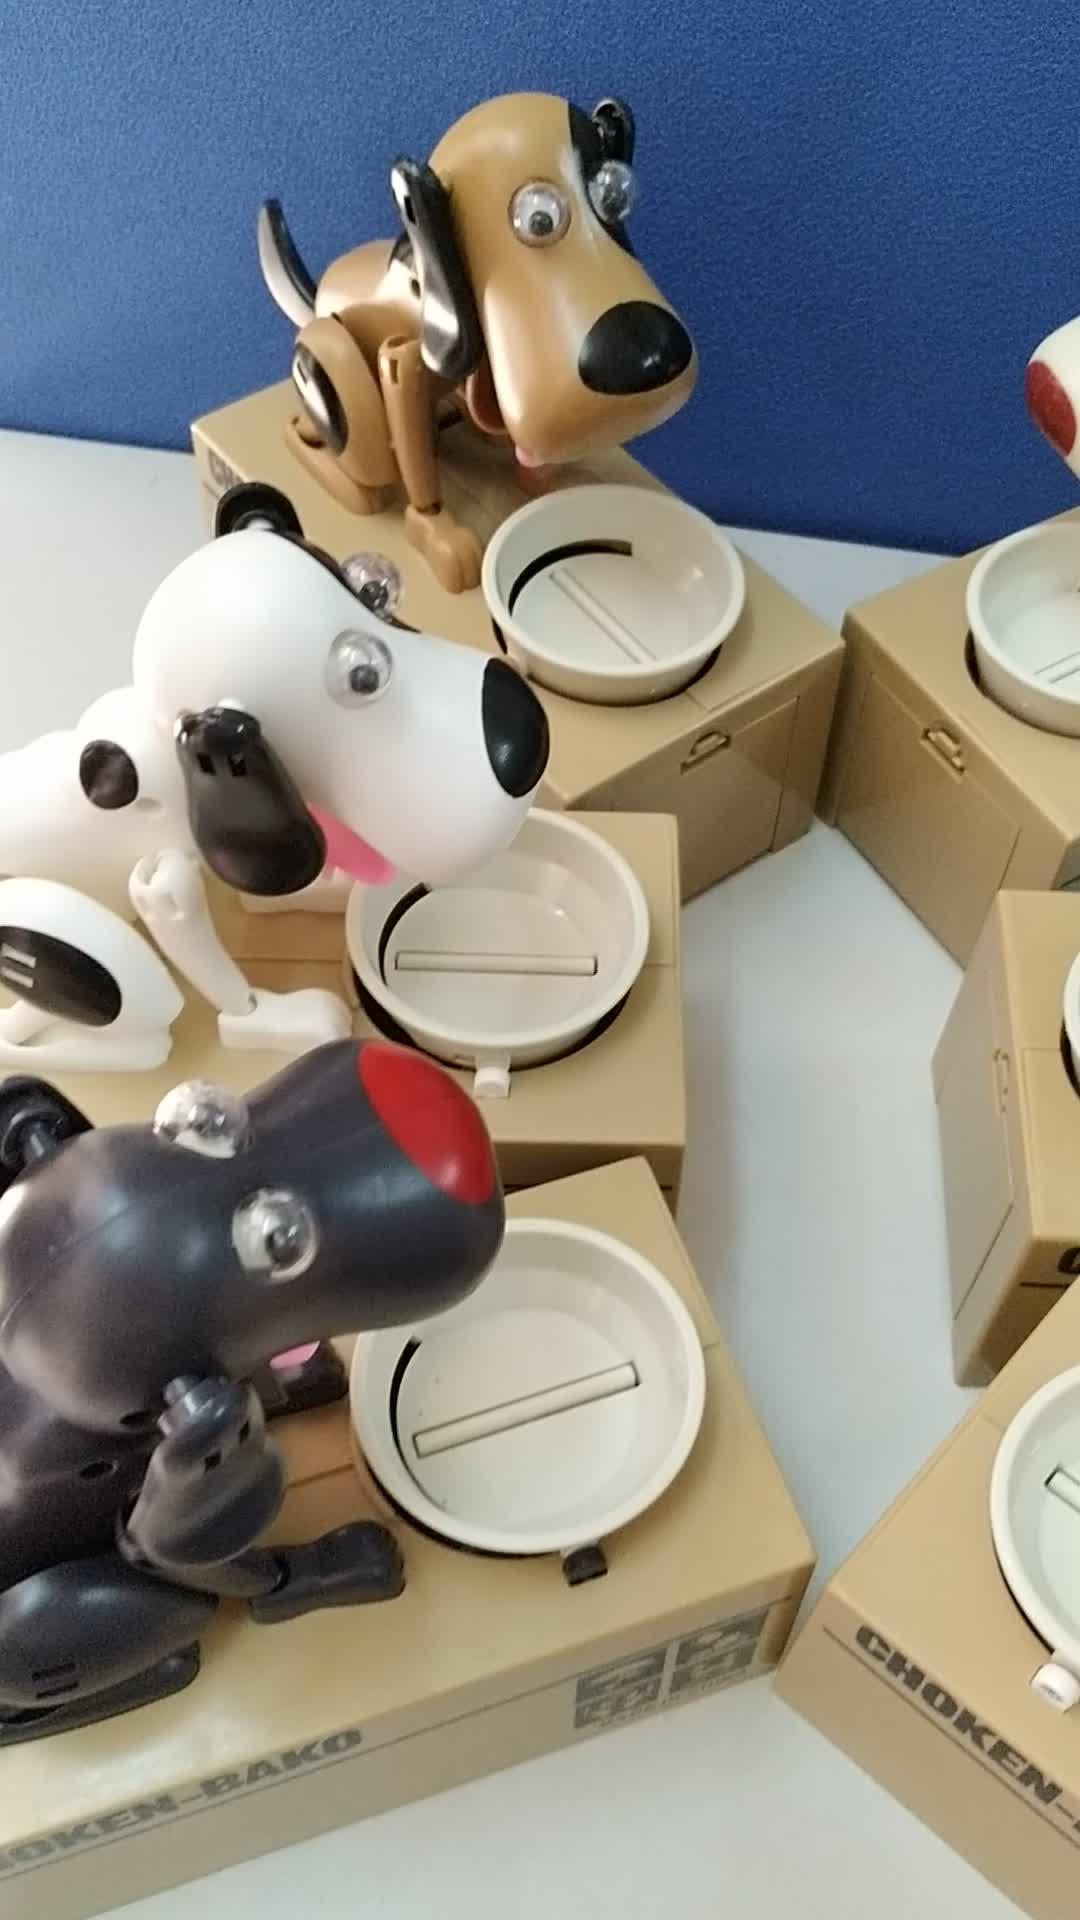 EN71 Robotic Choked Plastic Dog Spardose, die Hundemünzenbankspielzeug isst